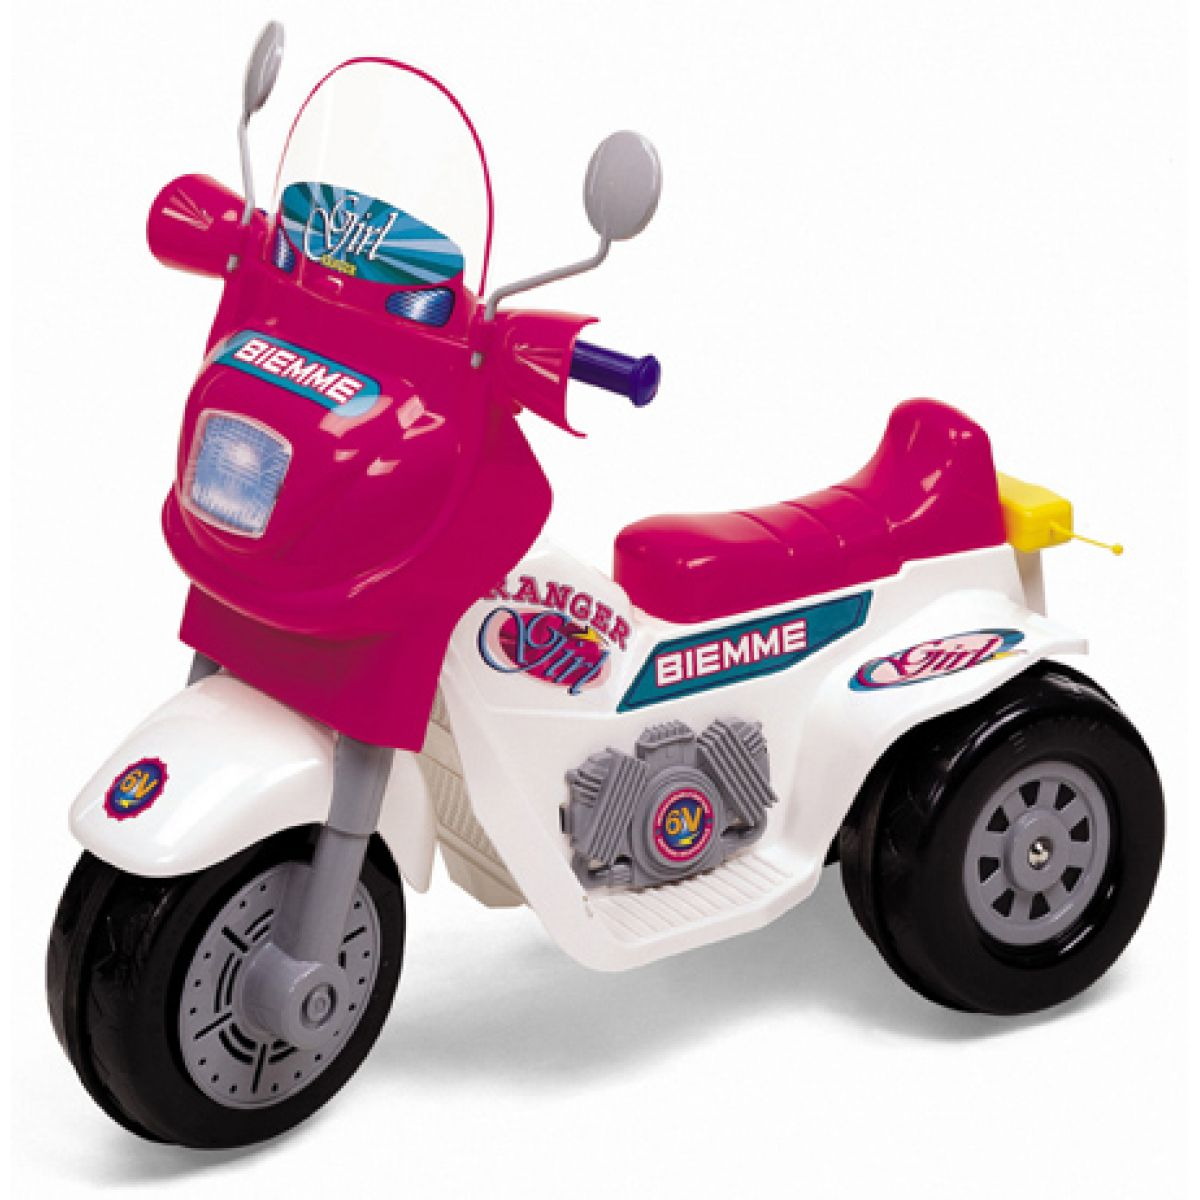 Motorka RANGER dívčí 6V Biemme